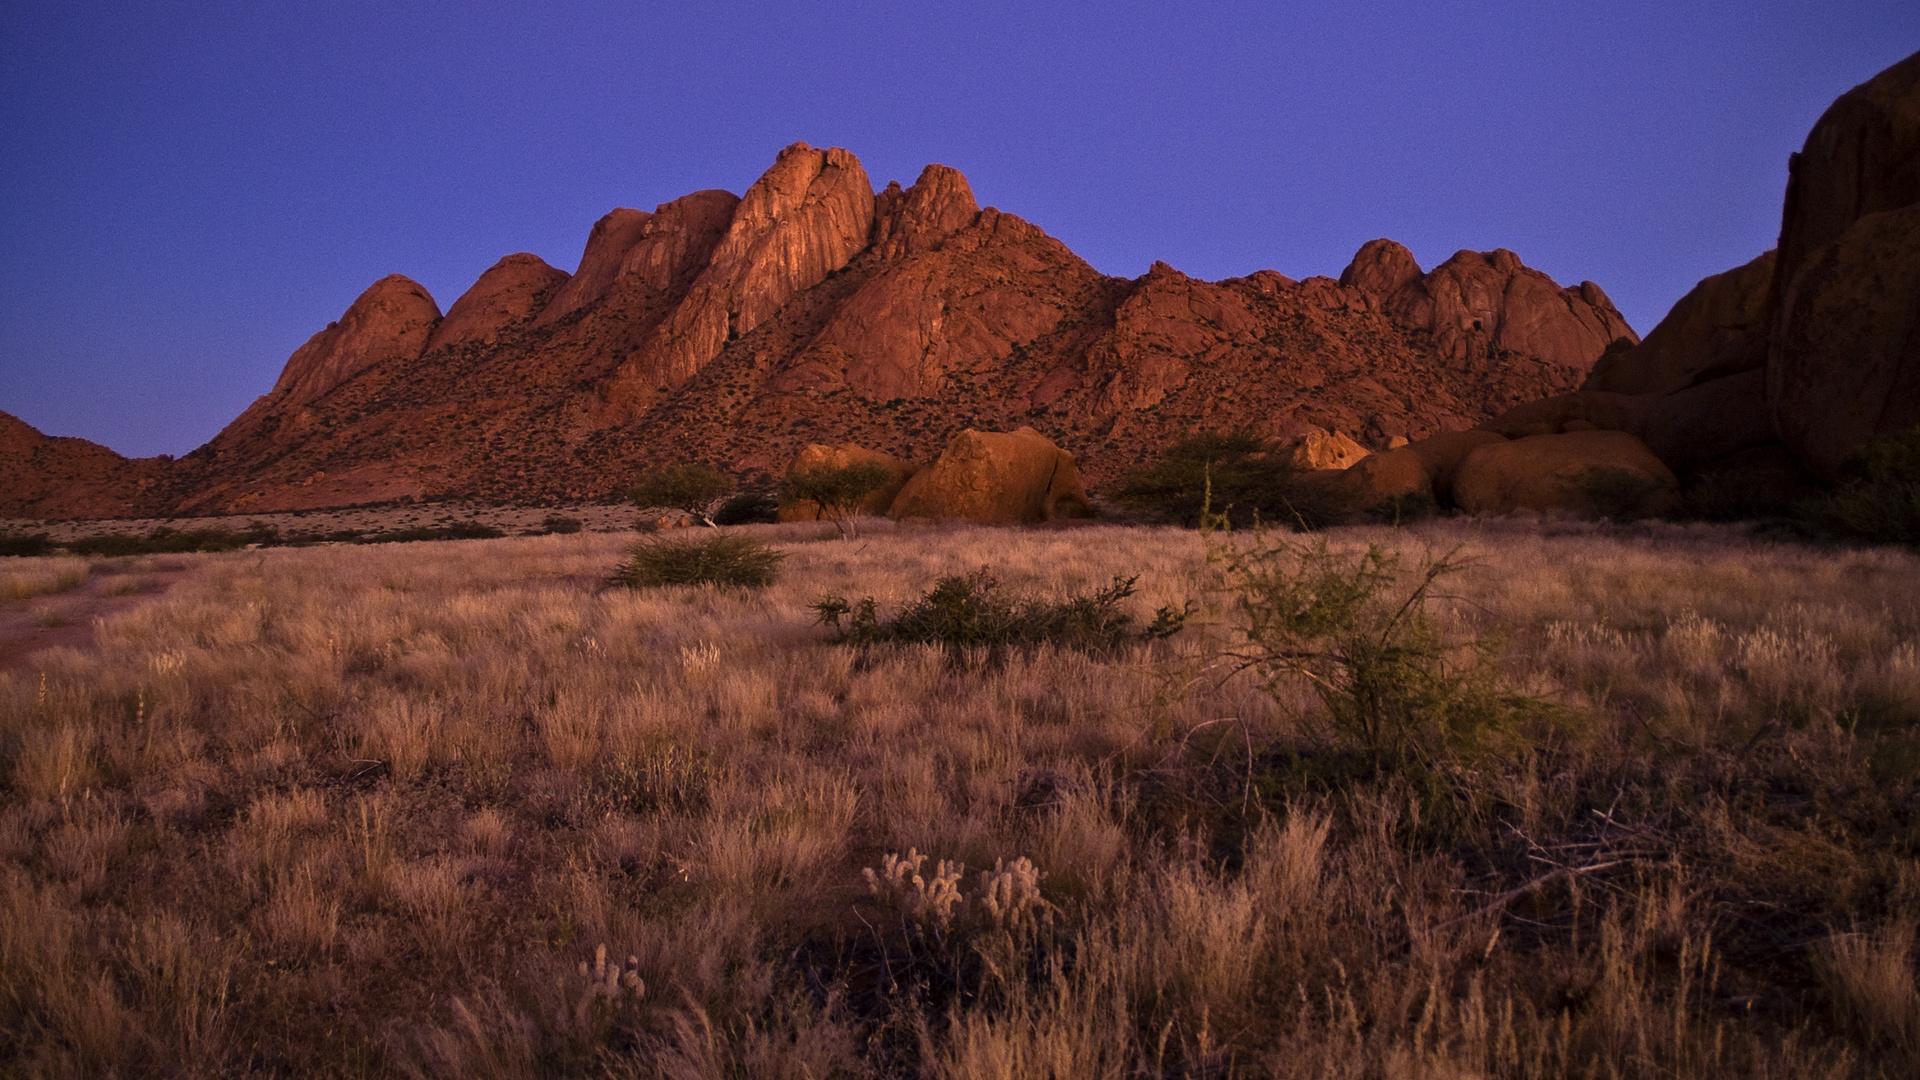 Spitzkoppe, Namibia, kurz nach dem Sonnenuntergang